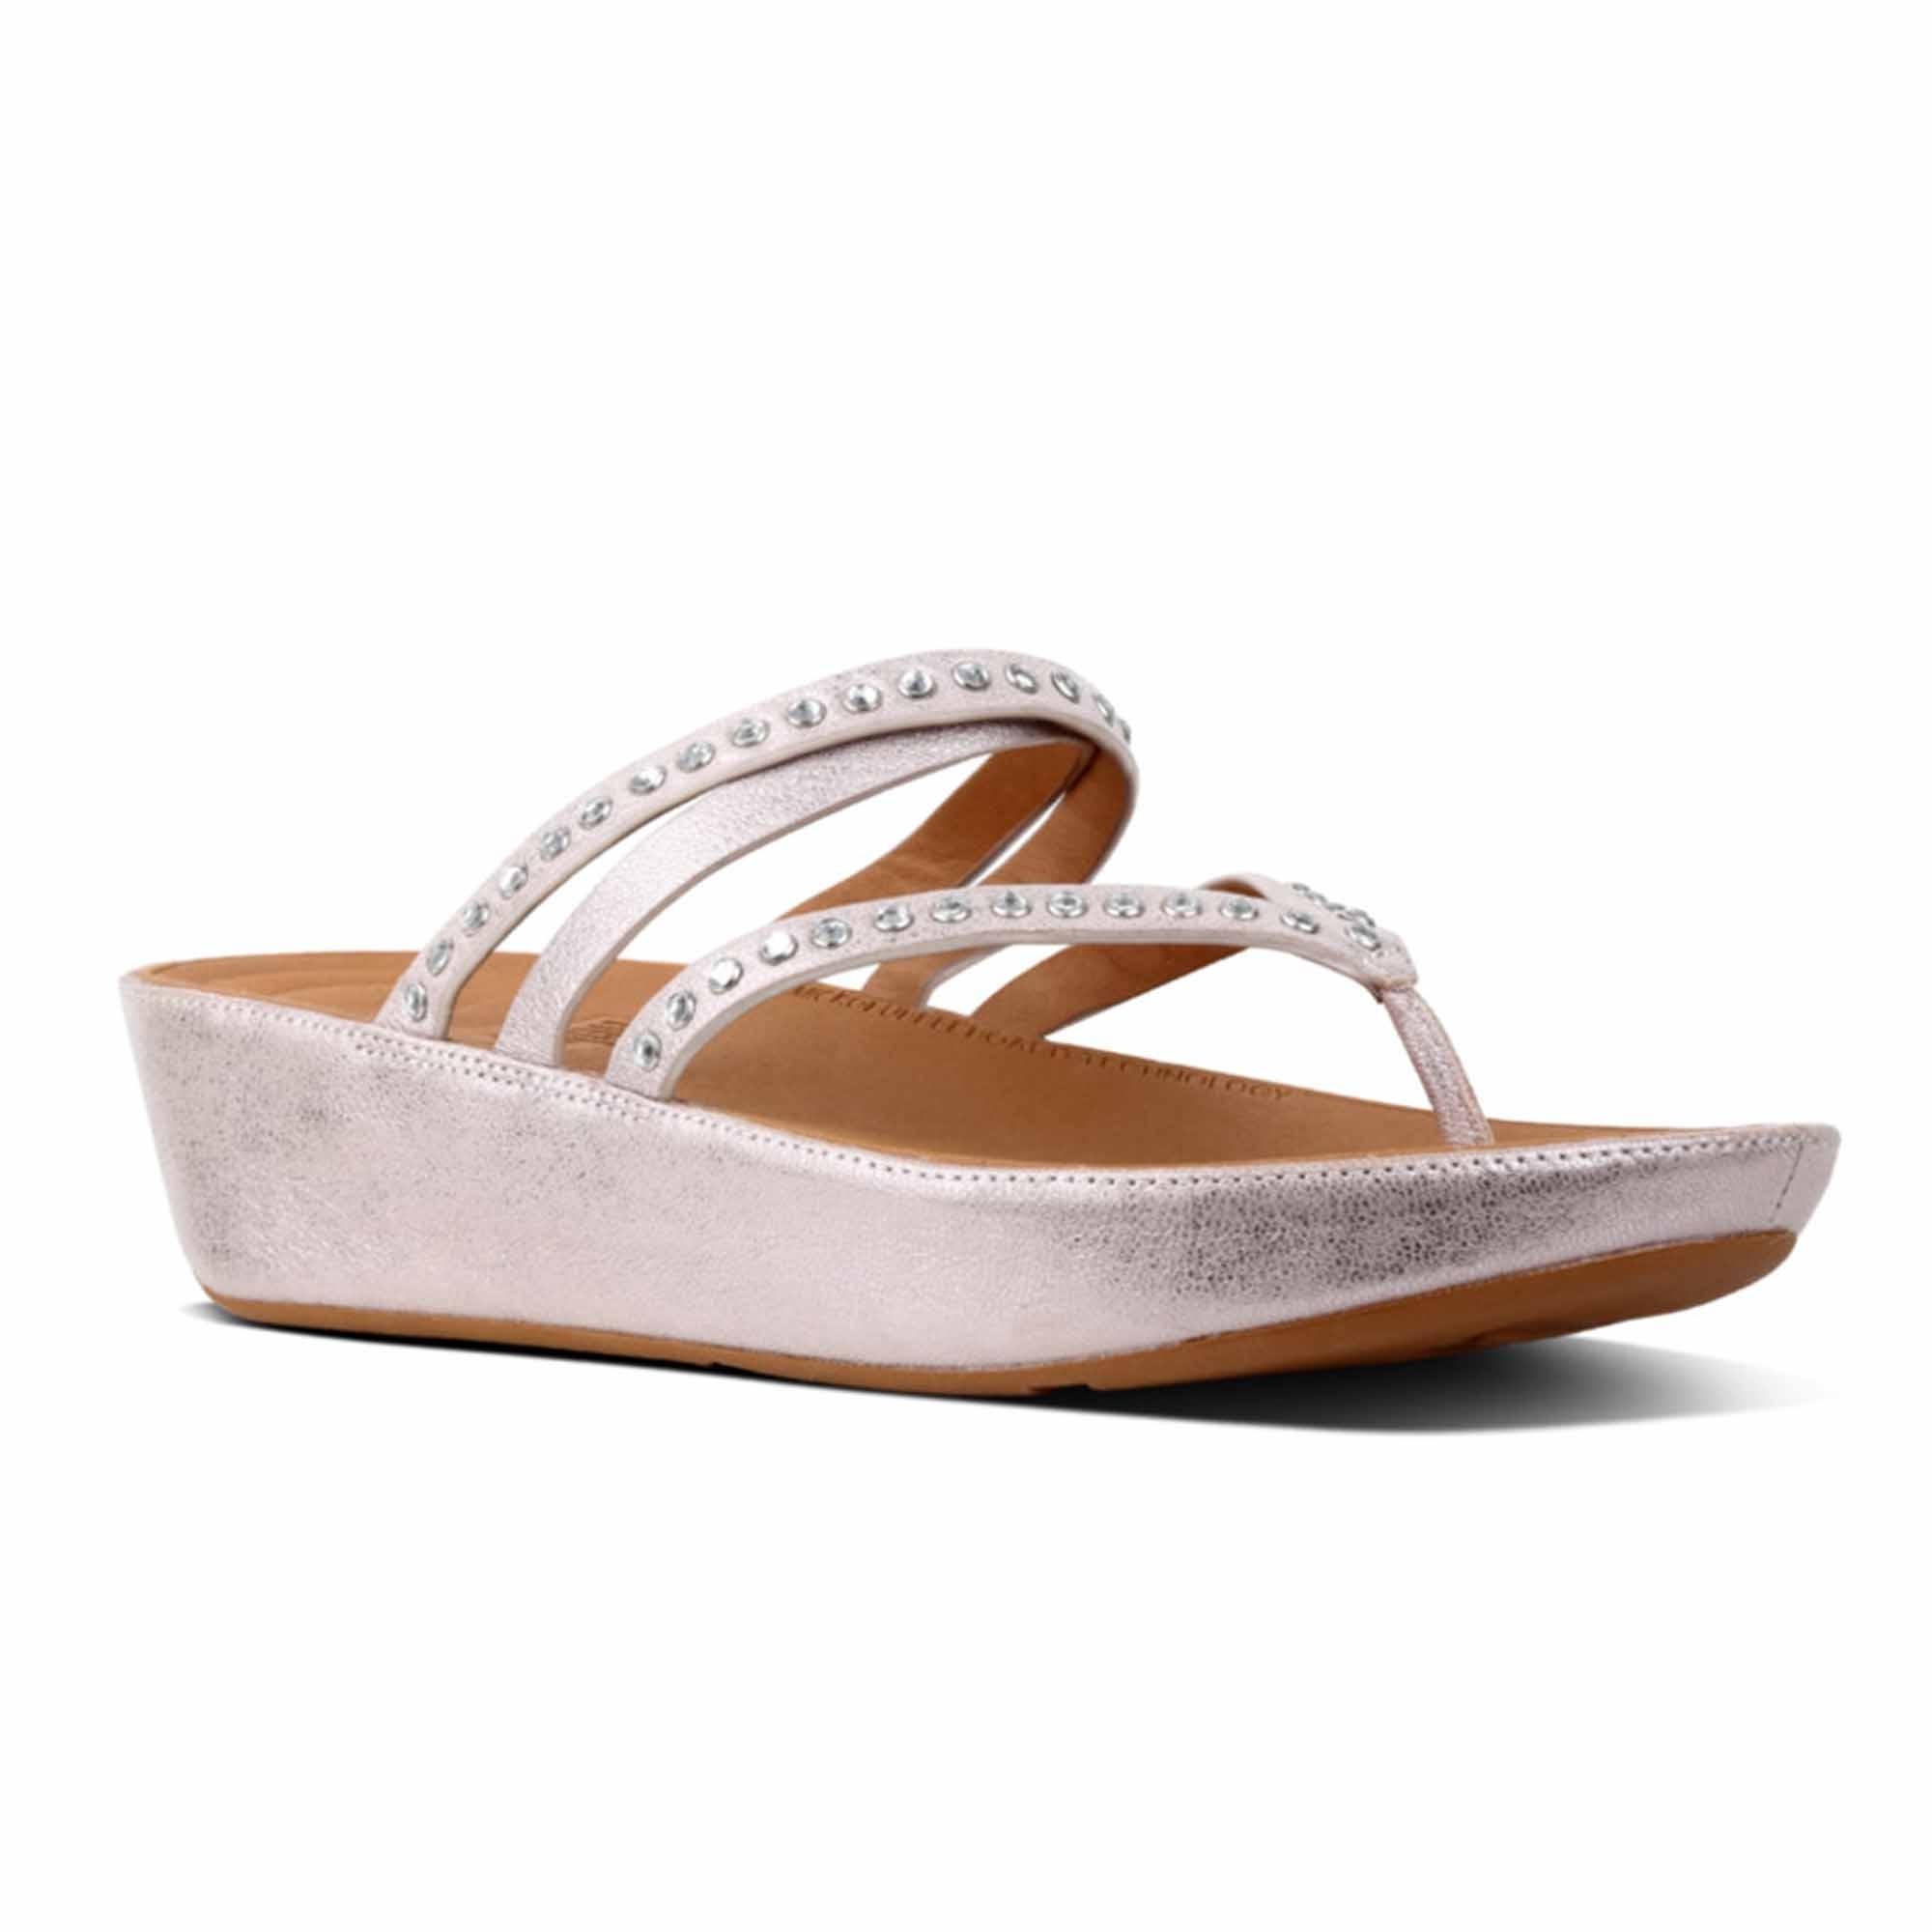 f8146ec8bbe FitFlop™ LINNY™ Ladies Leather Toe Post Sandals Blush Metallic